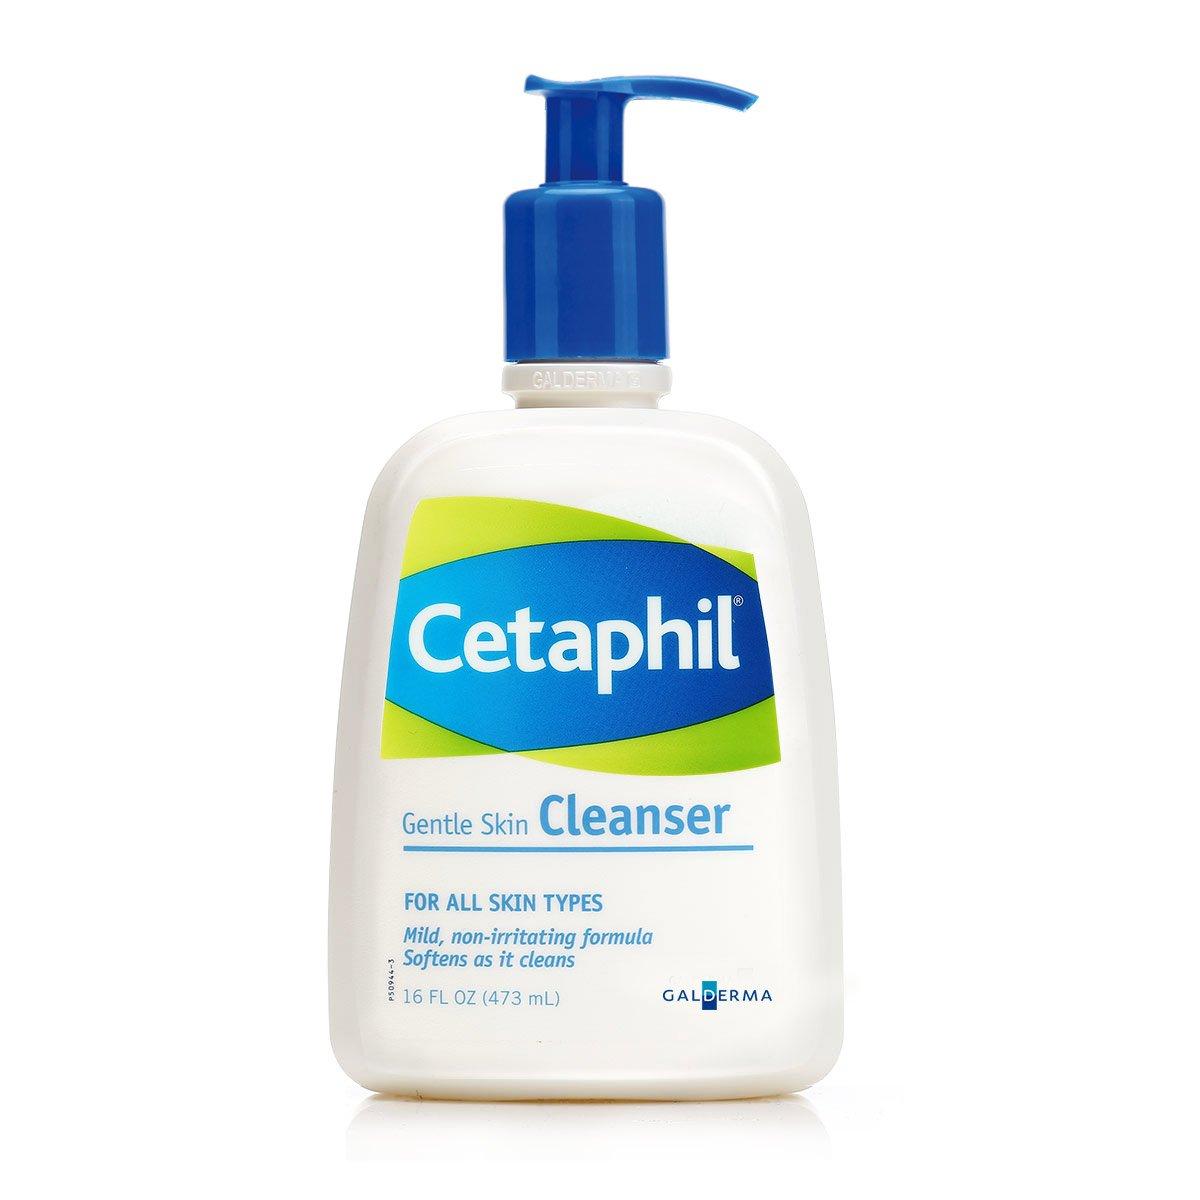 Cetaphil 丝塔芙 洁面乳473ml(加拿大或法国原装进口,两种产地随机发货)(进)(特卖)